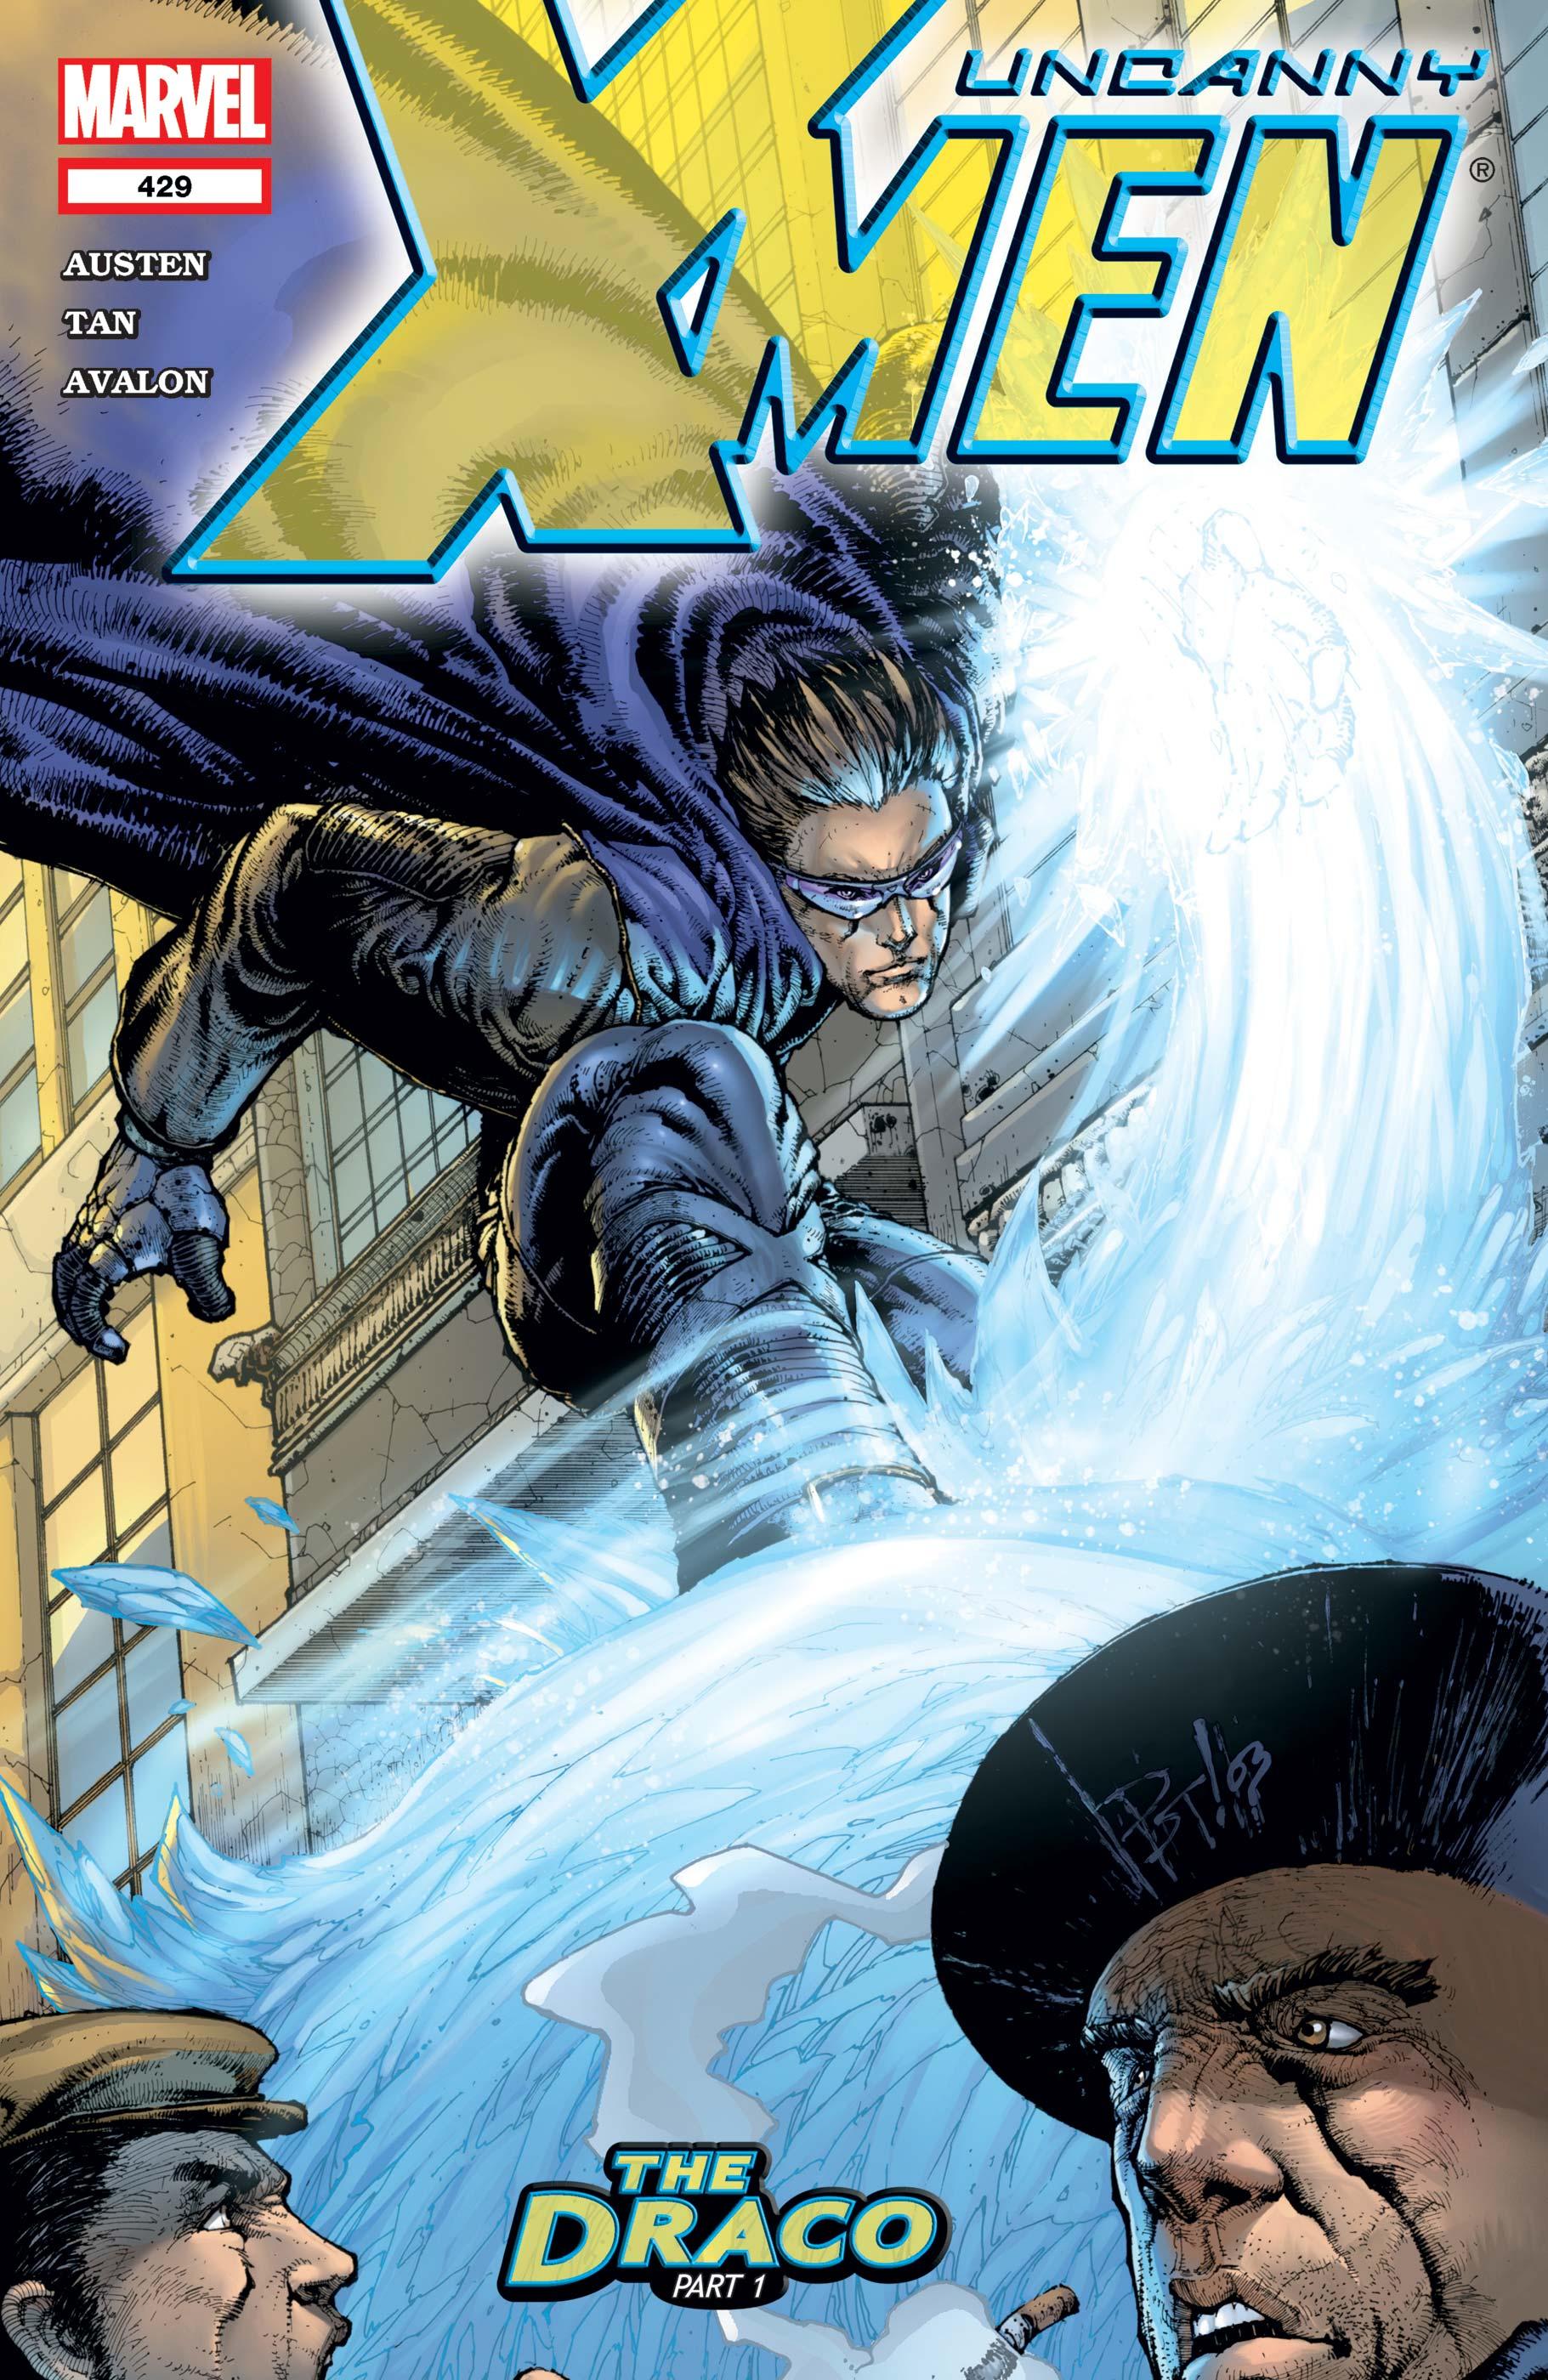 Uncanny X-Men (1963) #429